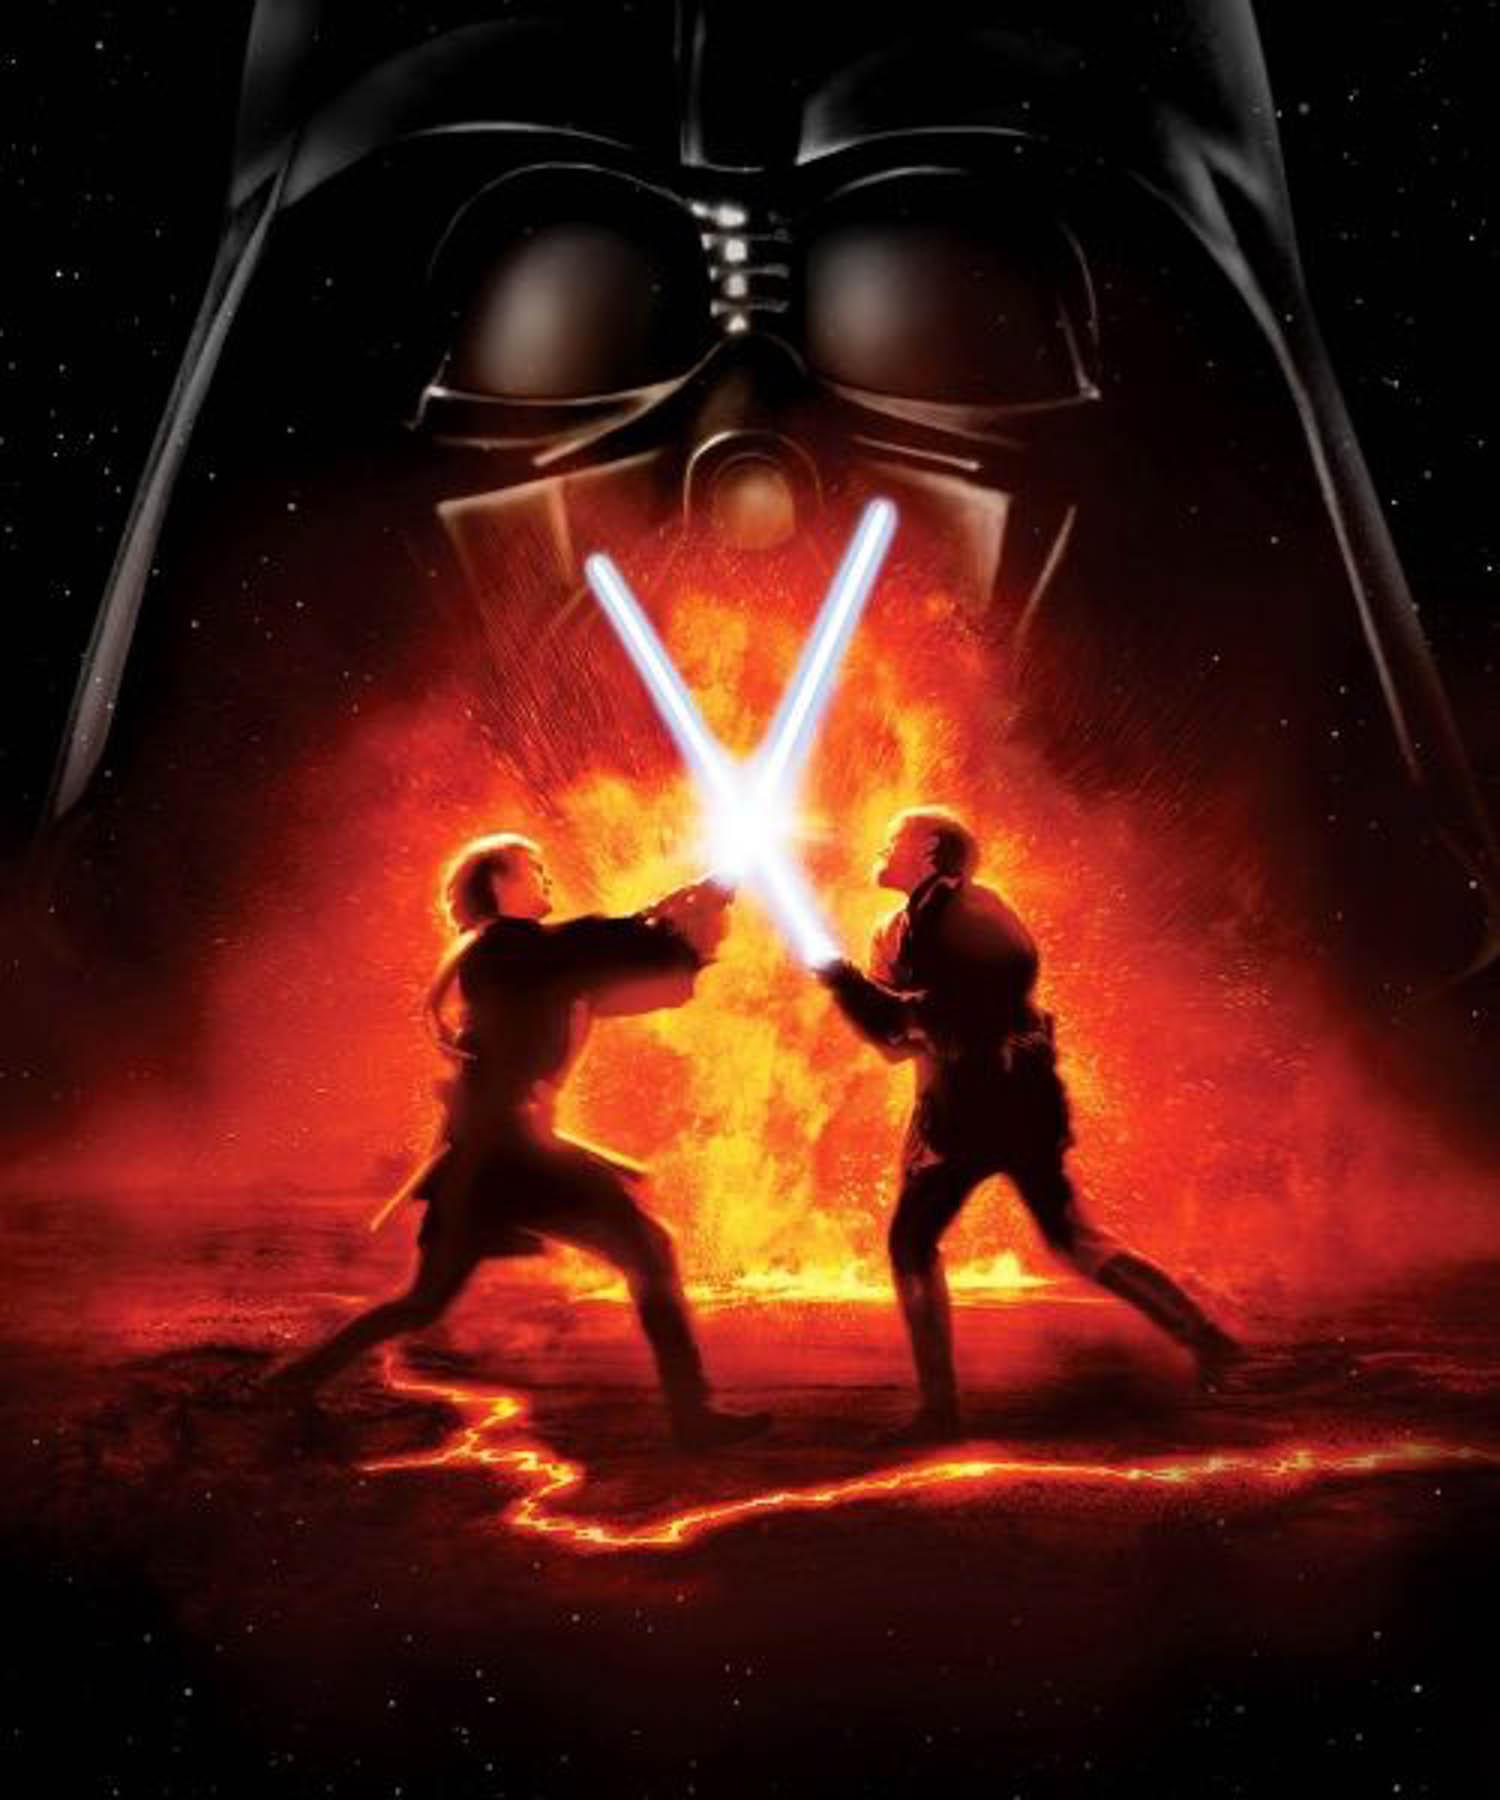 Obi-Wan Kenobi Hayden Christensen